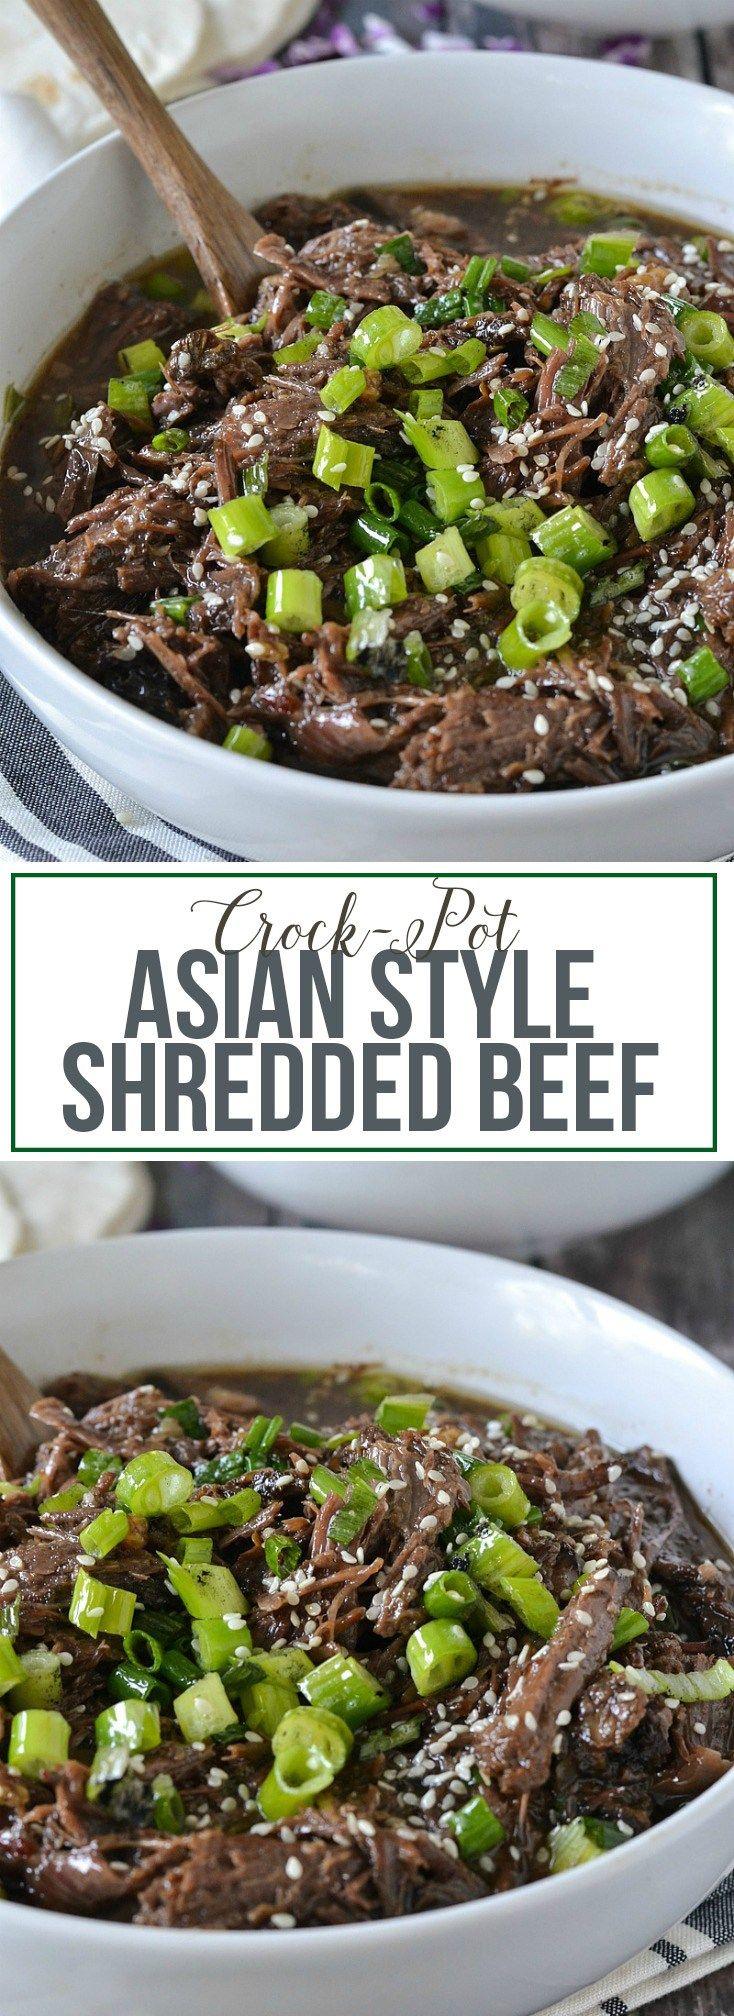 Crock Pot Asian Style Shredded Beef #CrockPotRecipes